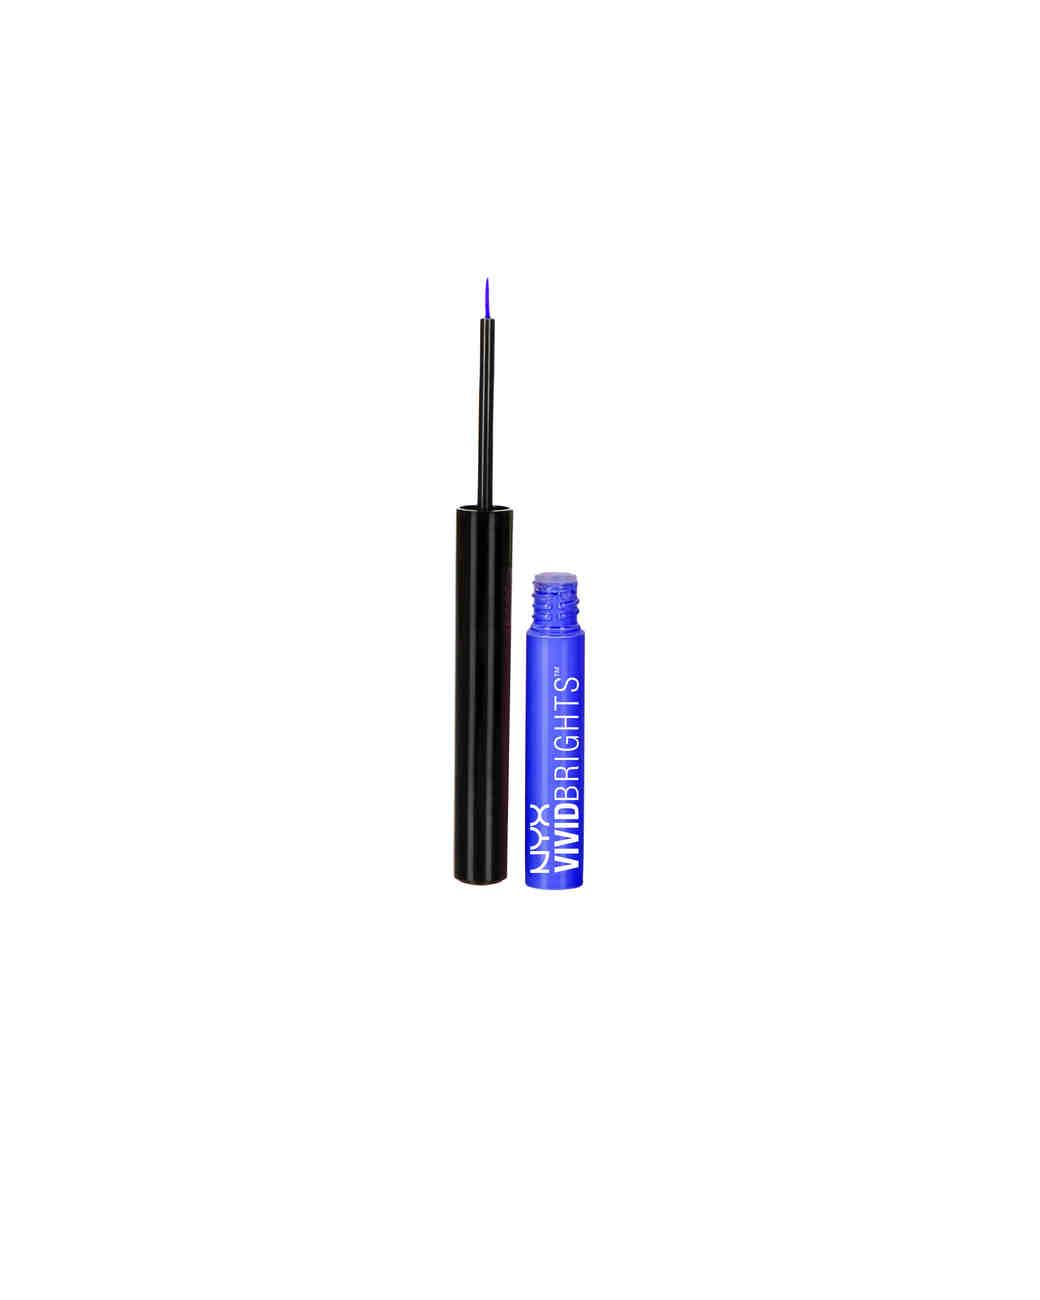 NYX Cosmetics Vivid Bright Liners